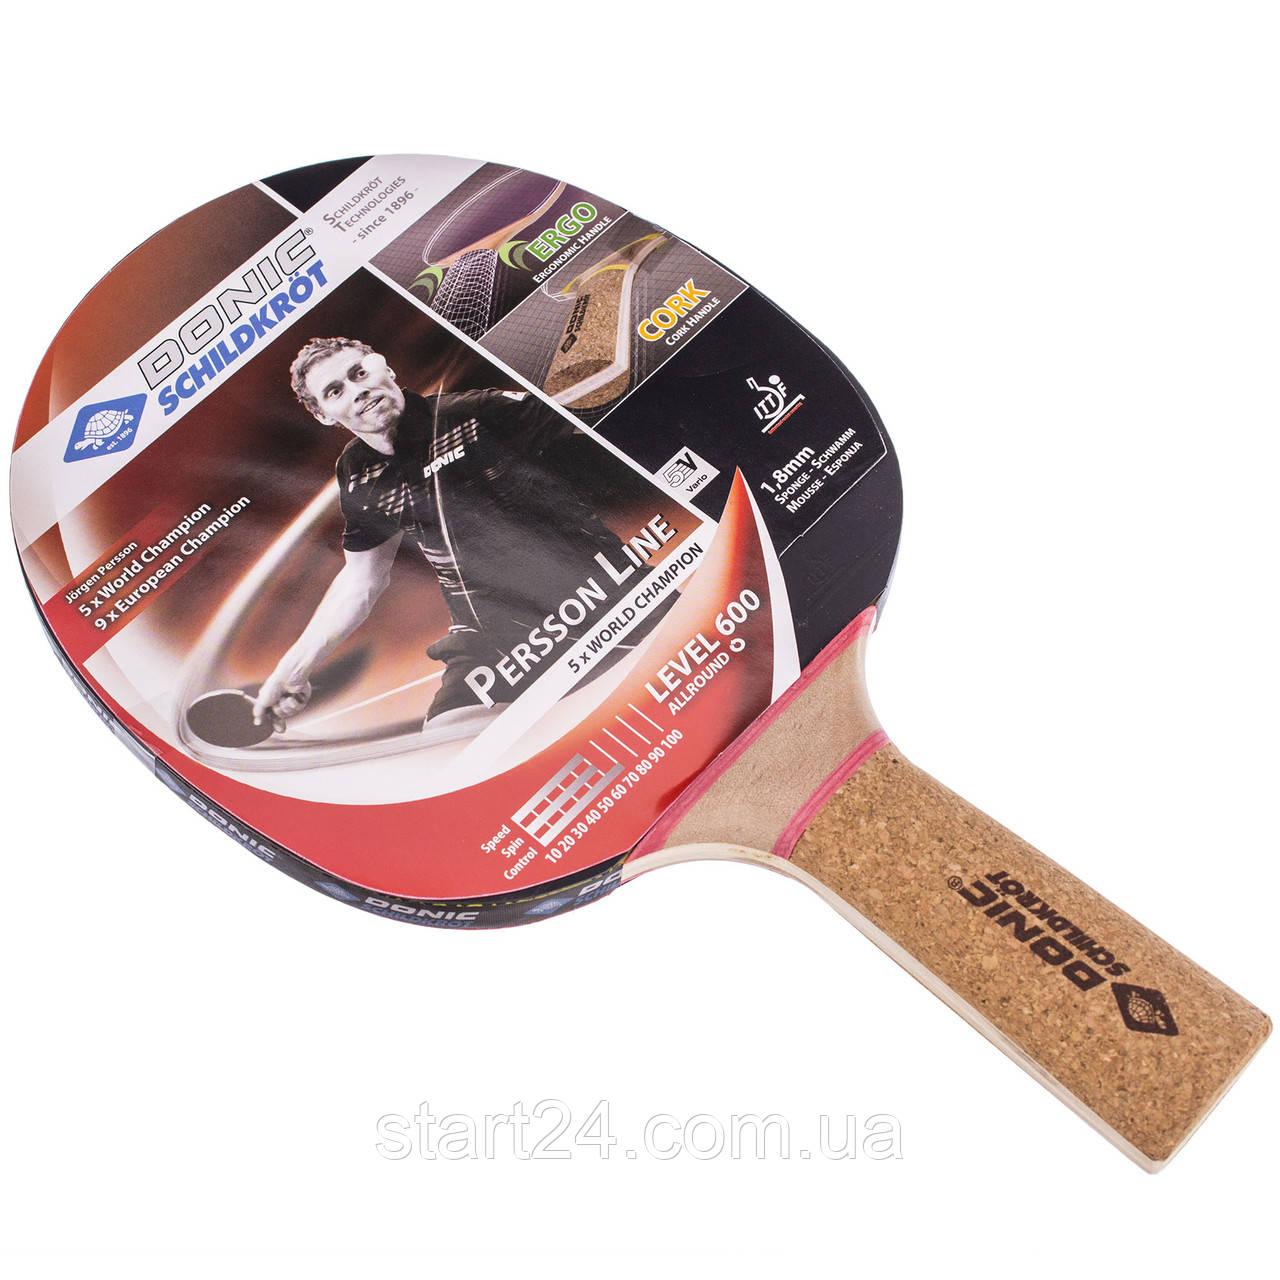 Ракетка для настольного тенниса 1 штука DONIC LEVEL 600 MT-728461 PERSSON (древесина, резина)